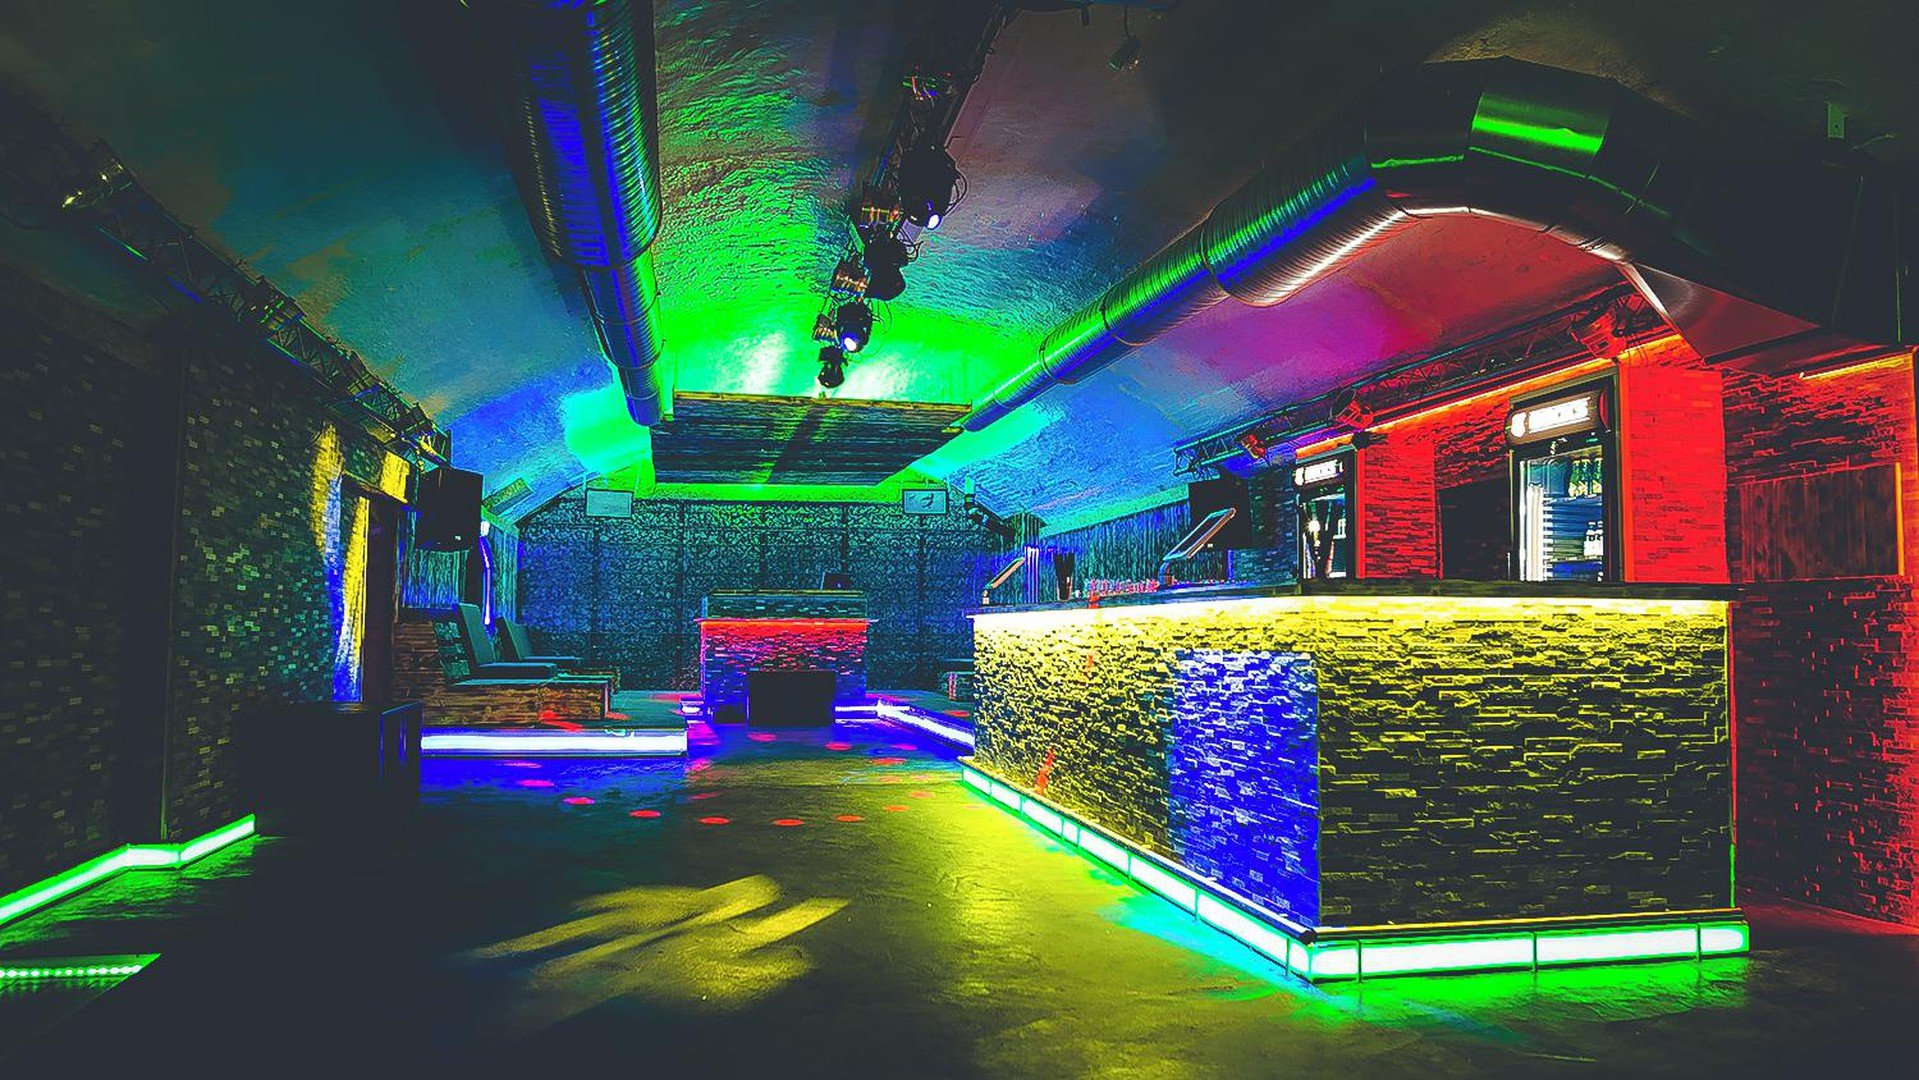 Nuremberg  Loft Cloud Erlangen - Bar Club Lounge & Events image 0